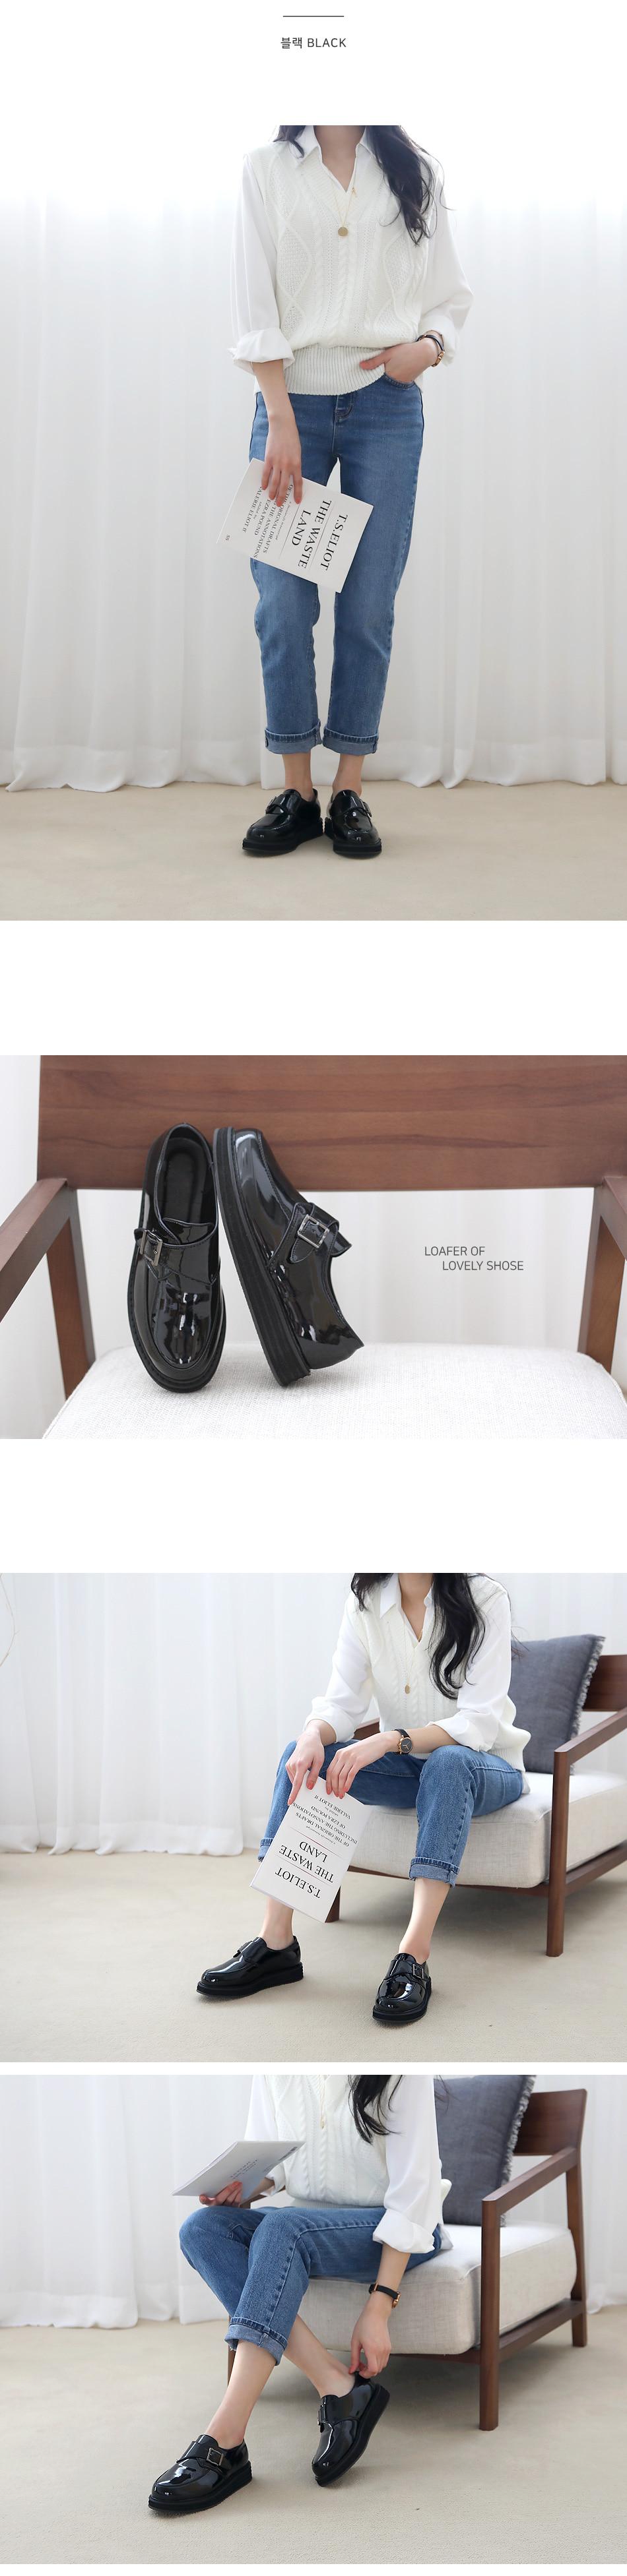 Dibeta Loafers 3cm